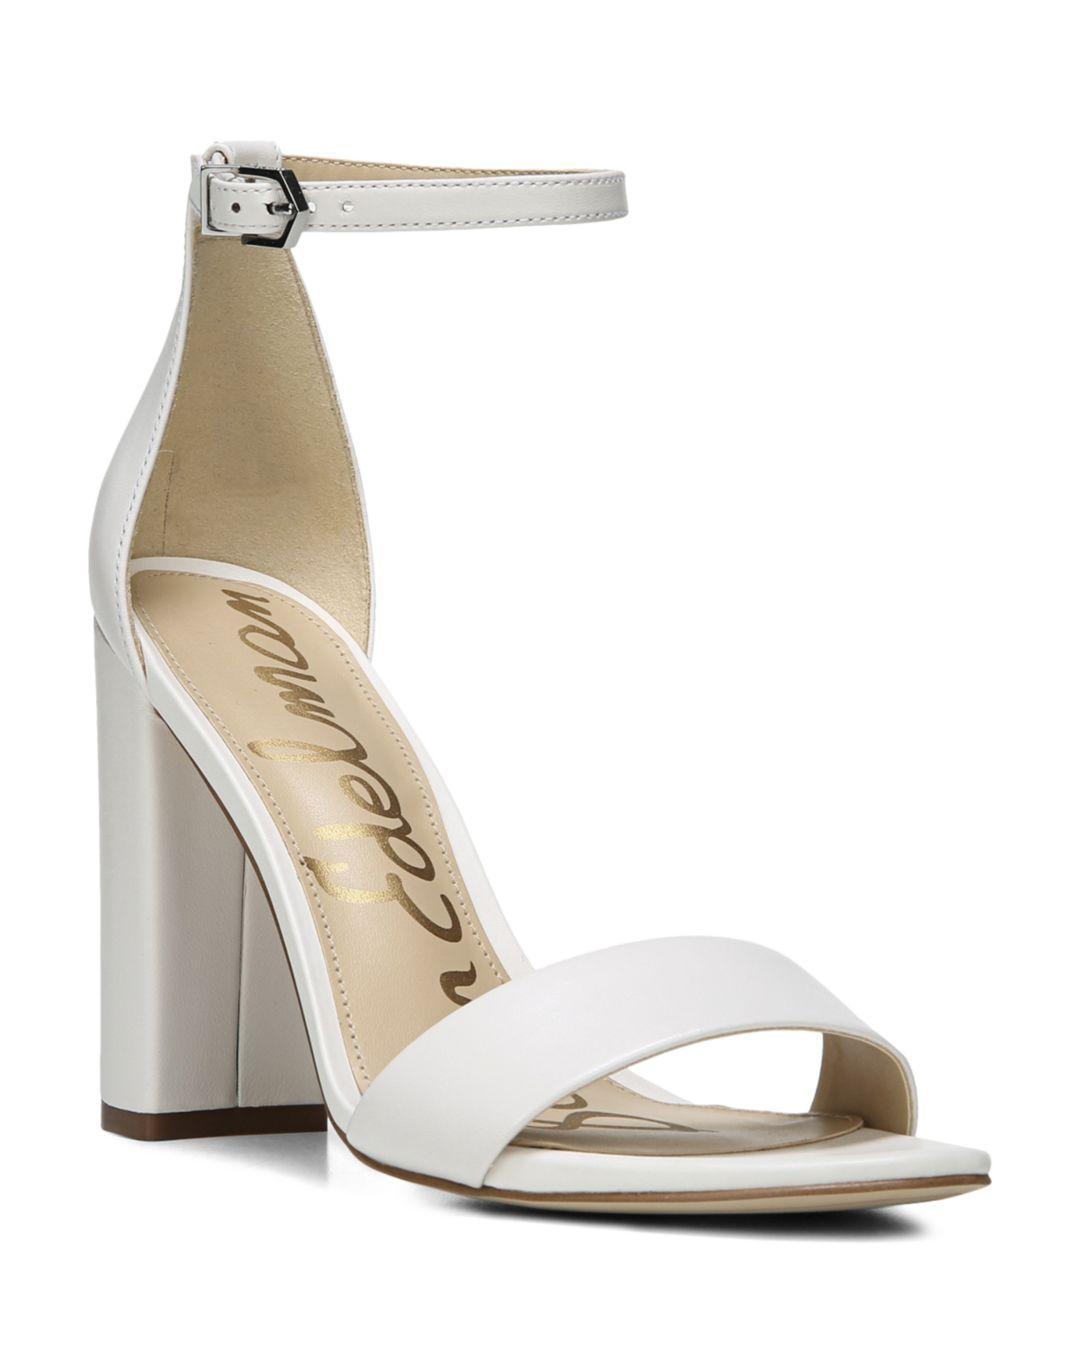 6f7f6c2e415f Lyst - Sam Edelman Women s Yaro Ankle Strap Block Heel Sandals in White